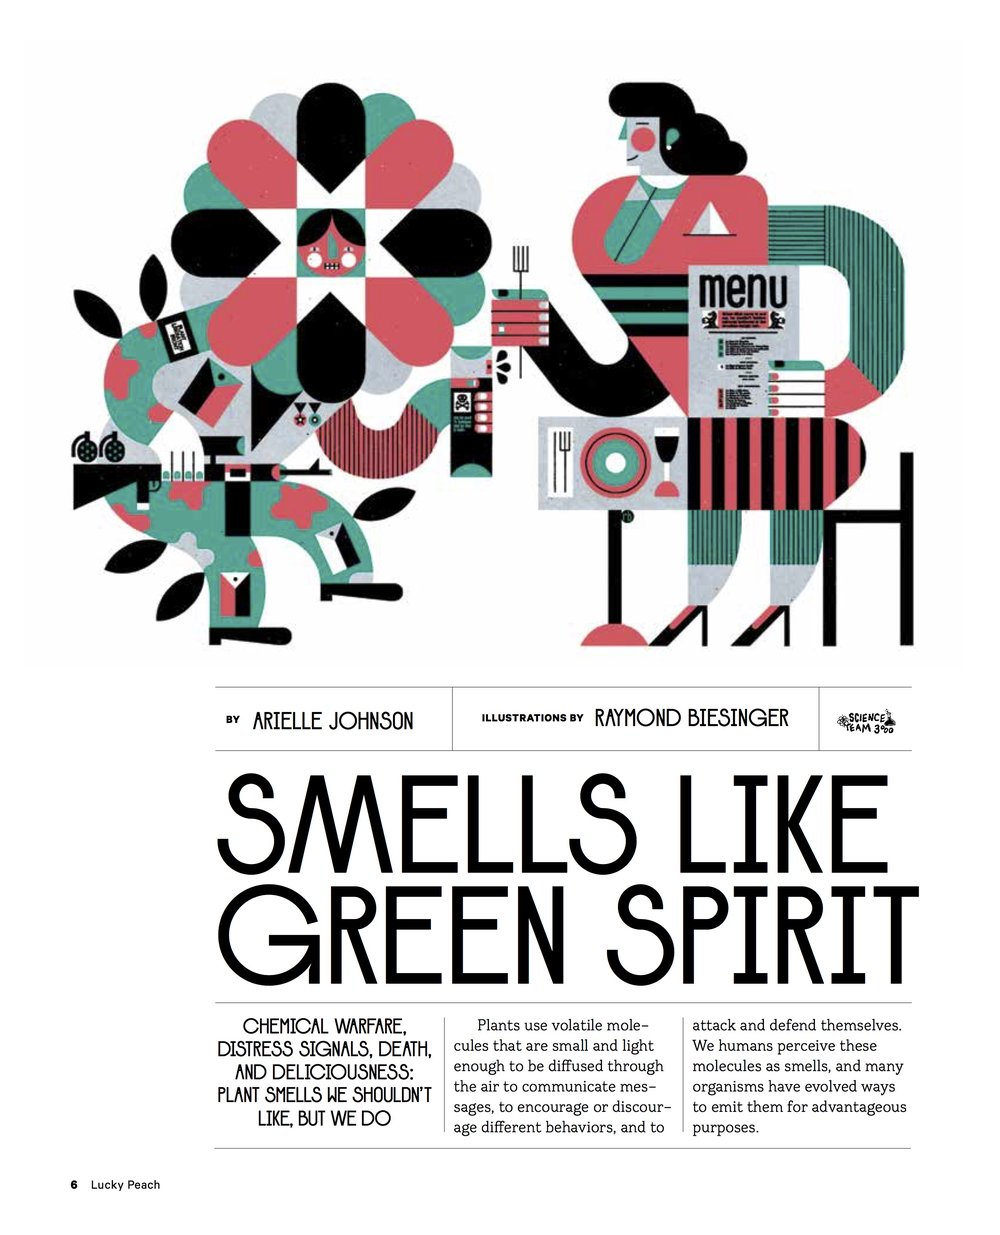 LuckyPeach-Plant Kingdom-Smells Like Green Spirit-Arielle Johnson.jpg